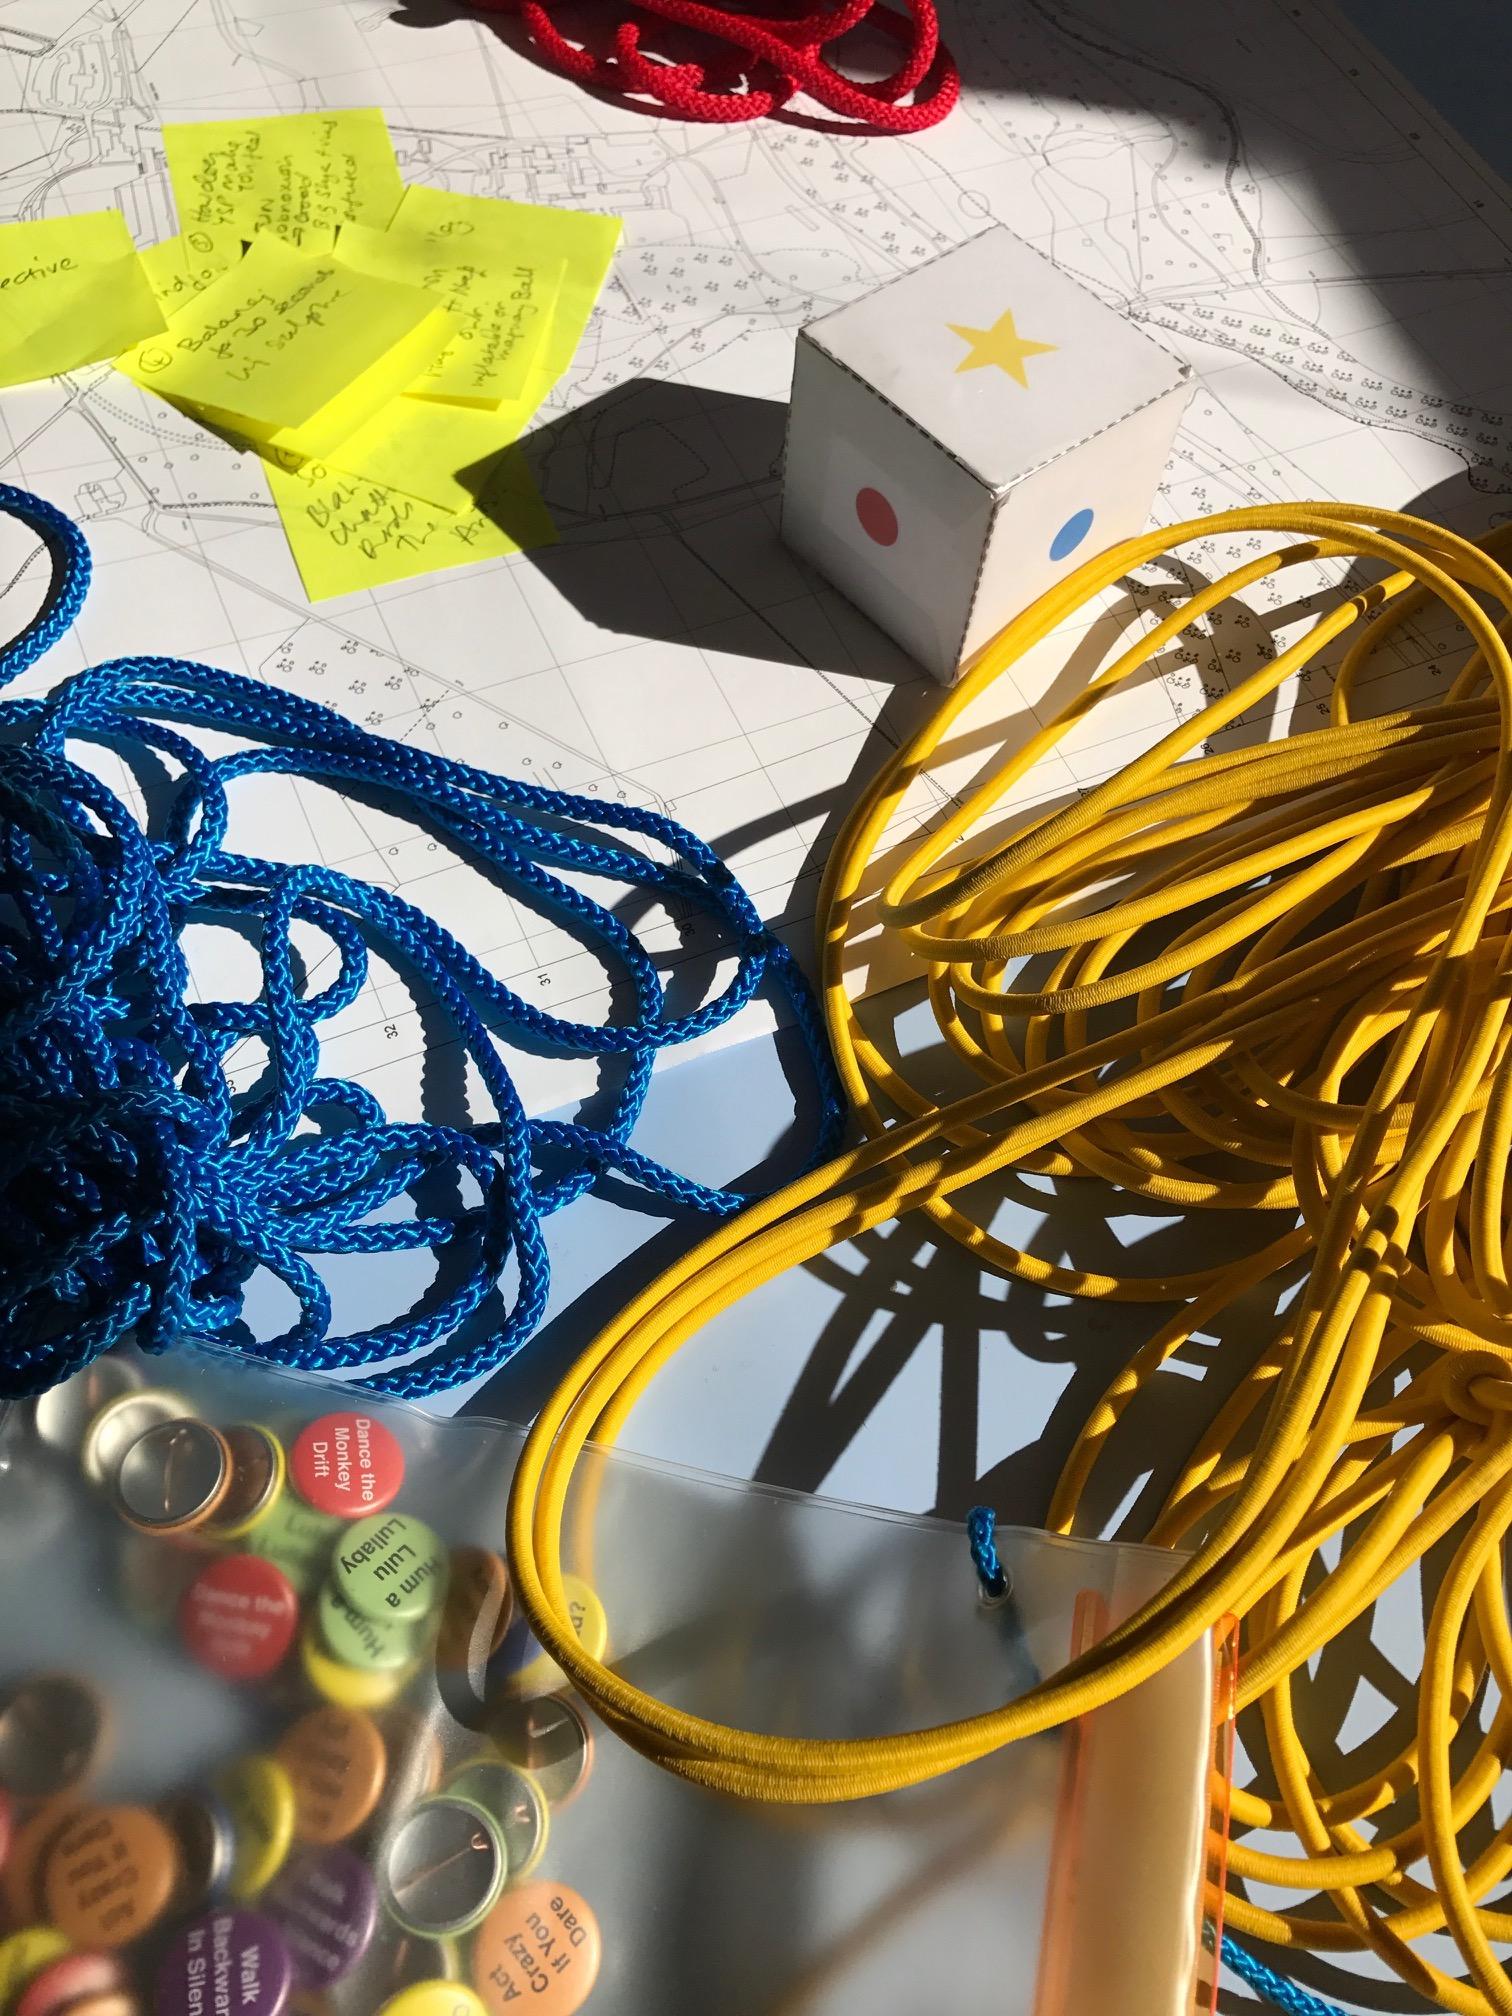 Thread Crazy Electrical Wiring